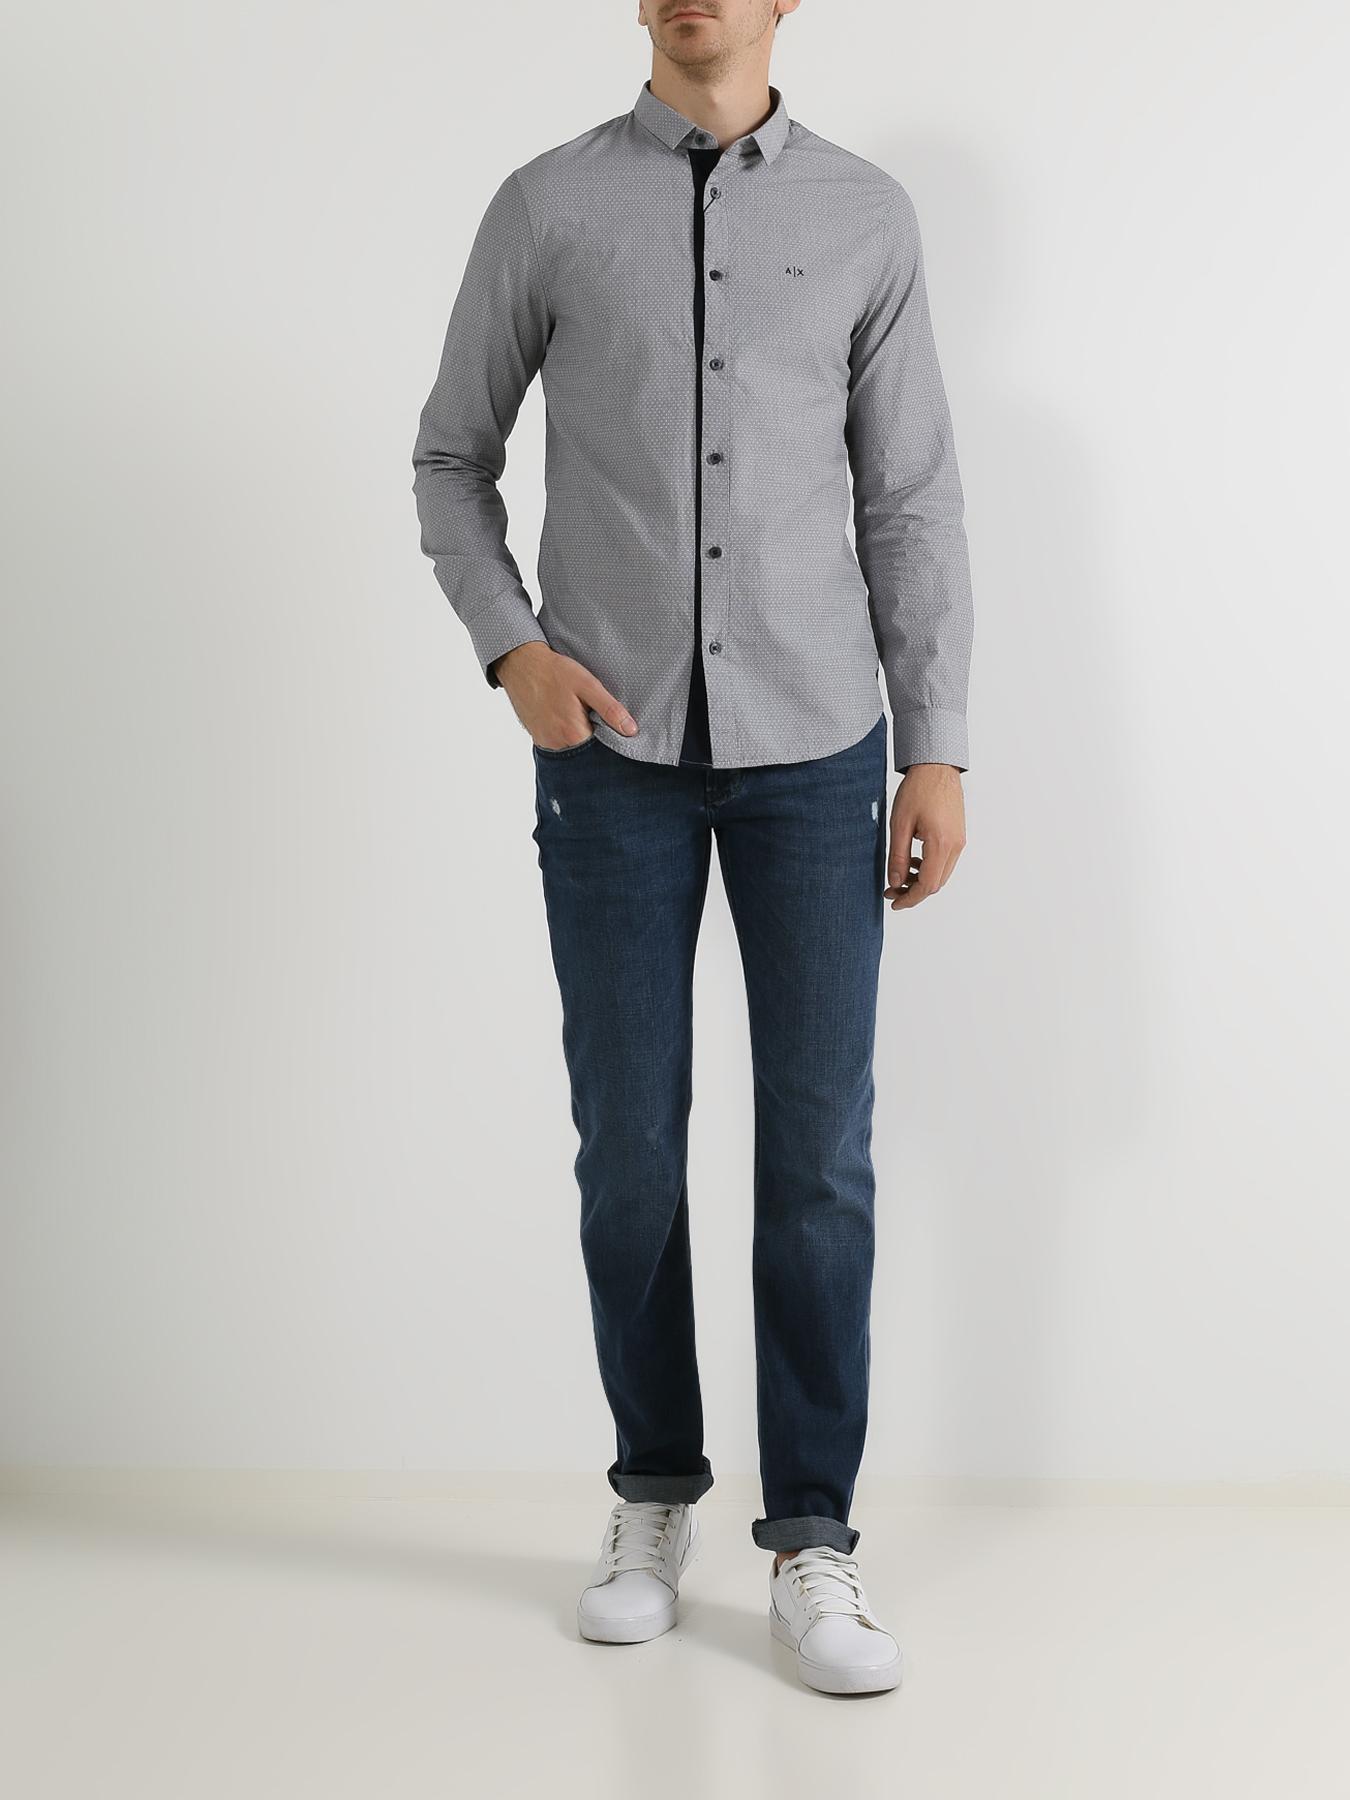 Фото - Брюки Baldessarini Мужские джинсы джинсы мужские prps fury